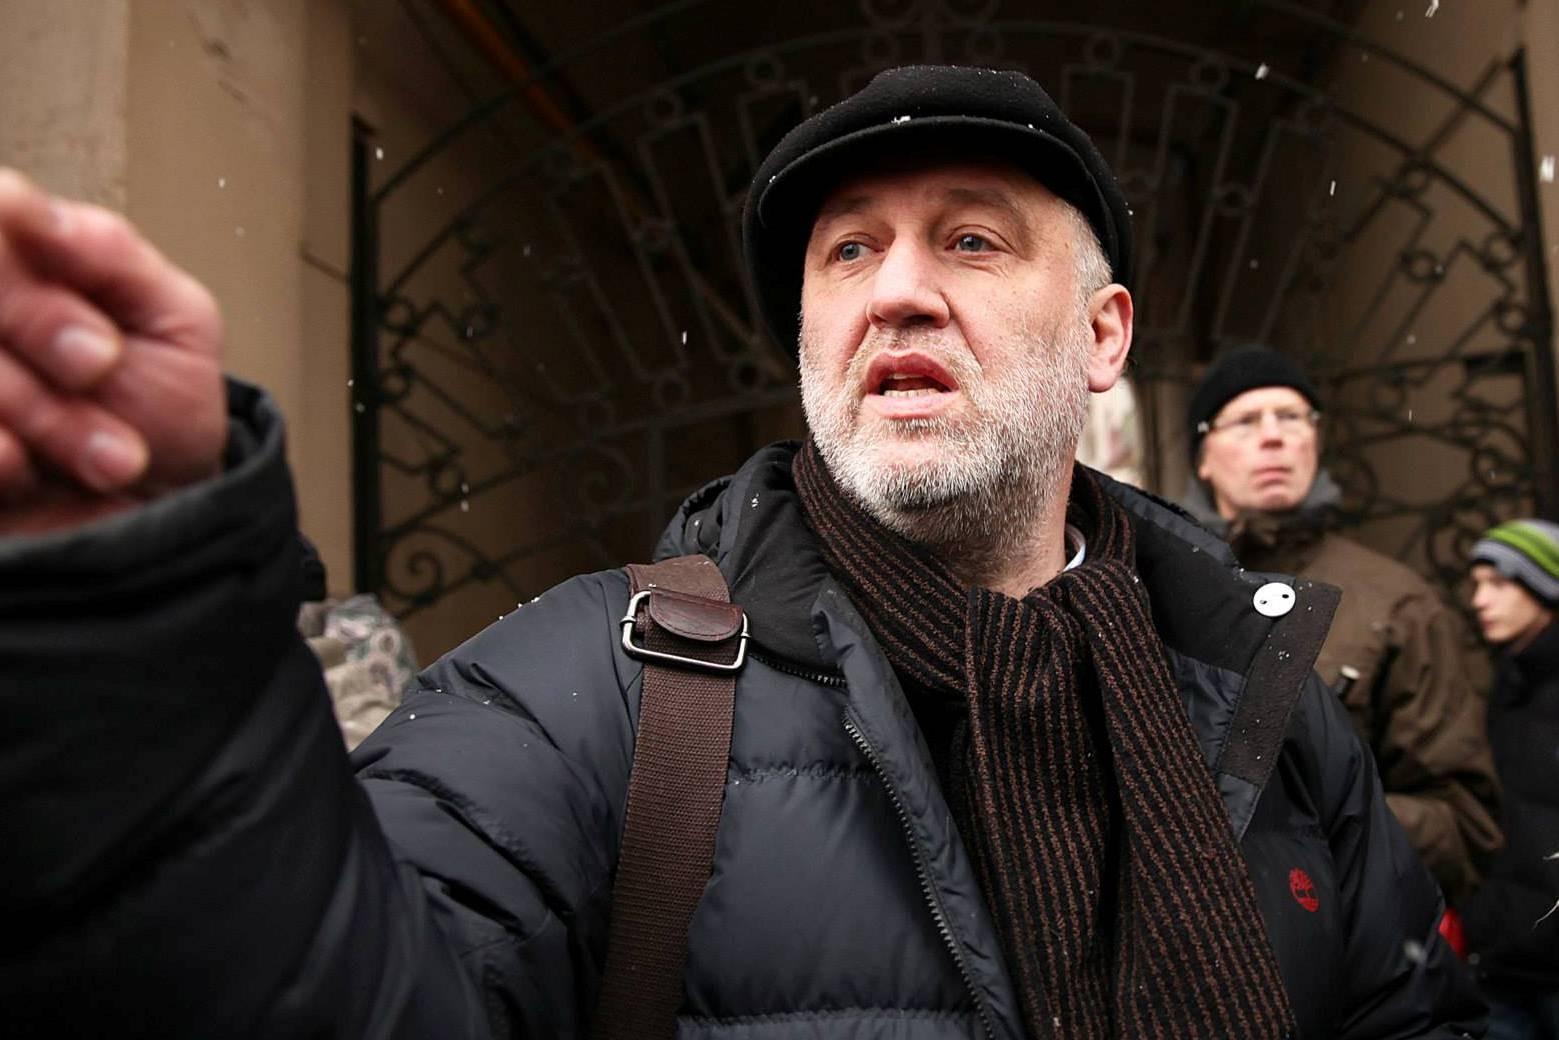 Репортера Сергея Пархоменко исключили изРусского ПЕН-центра